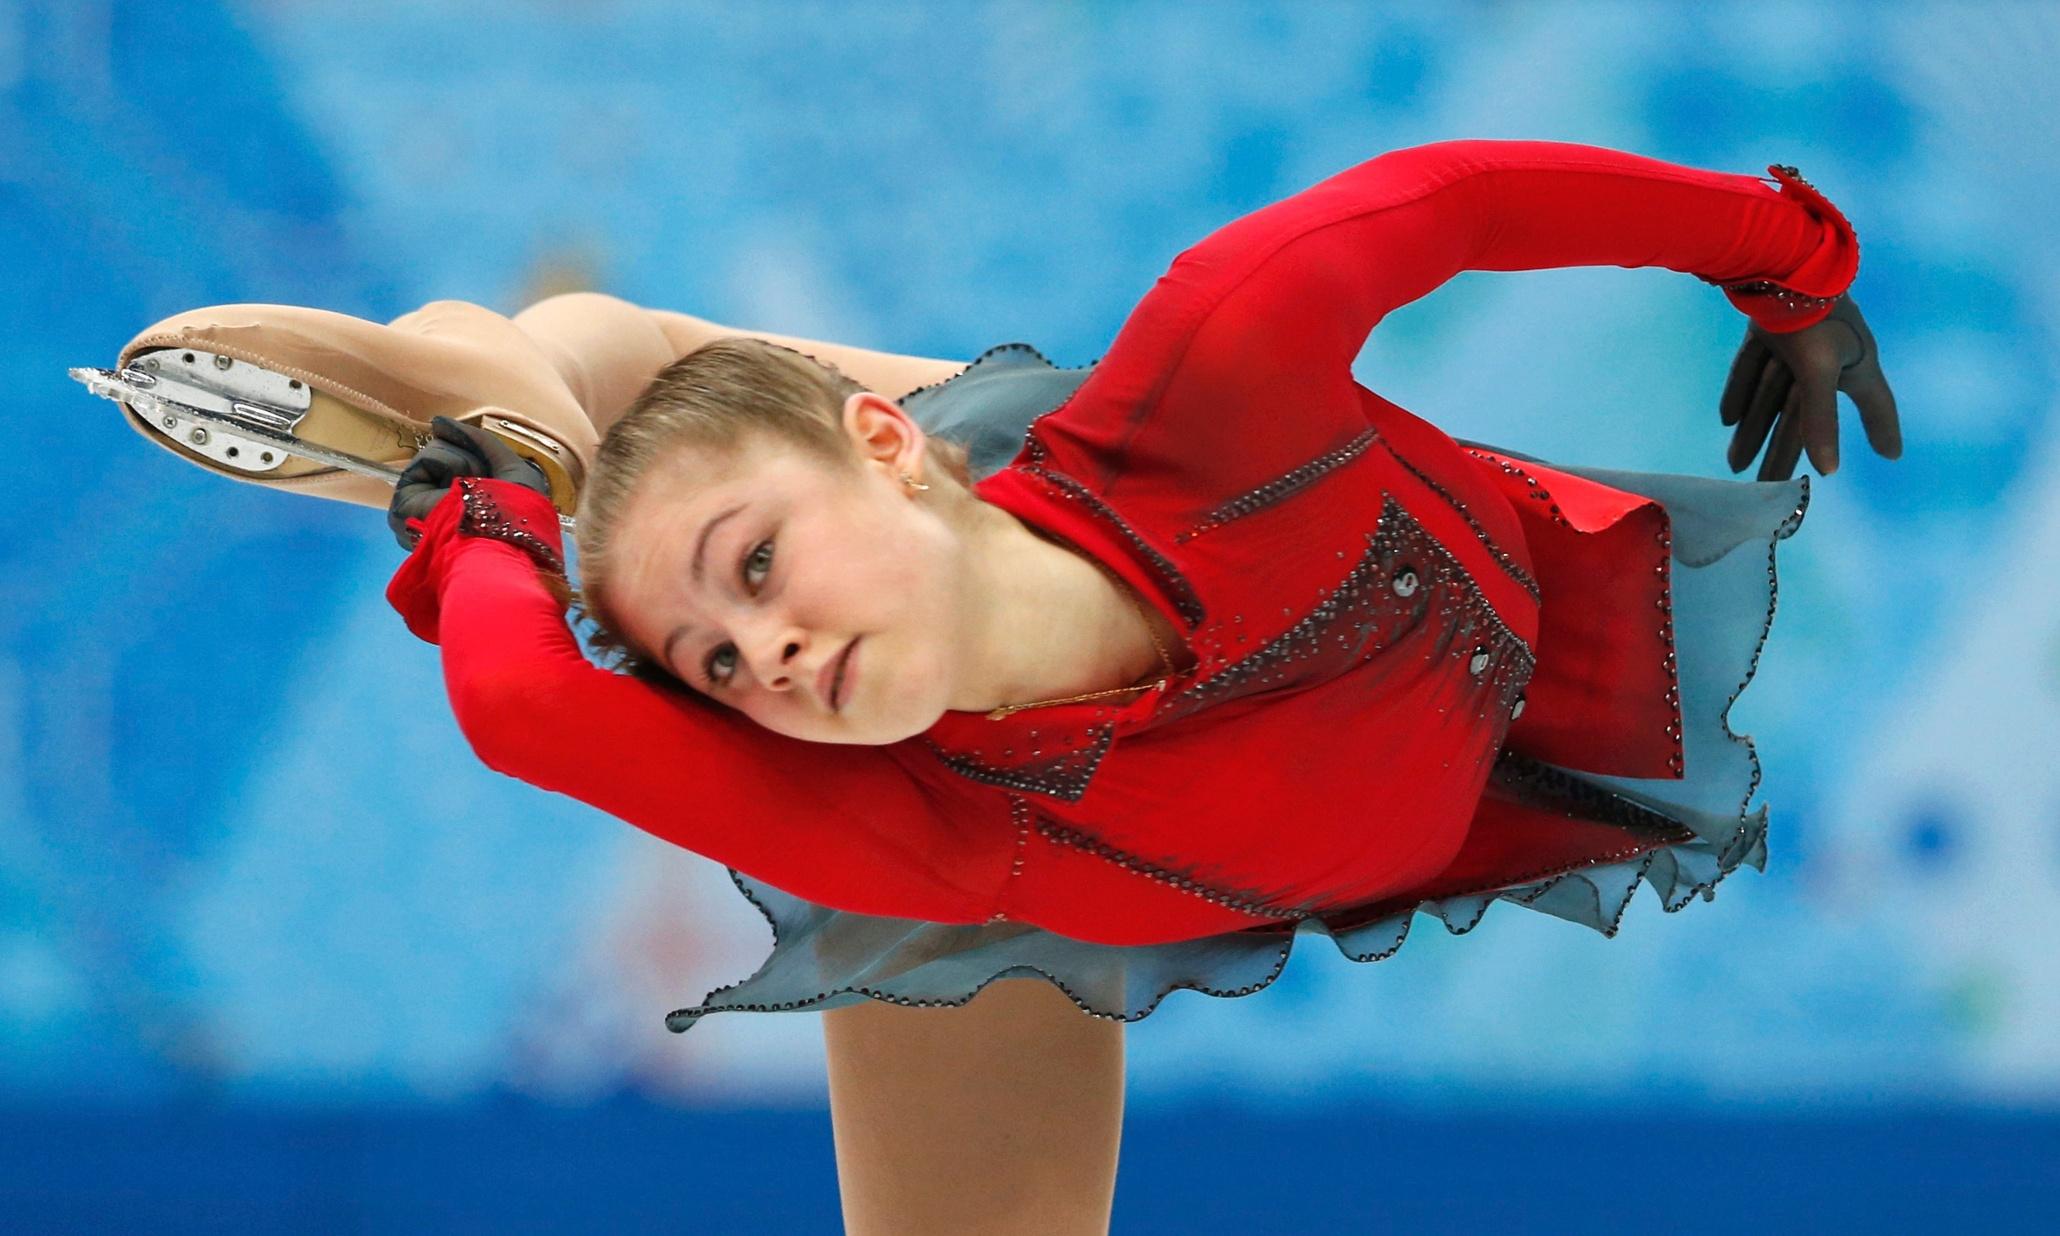 Sochi 2014: Yulia Lipnitskaya wows crowds at the Winter